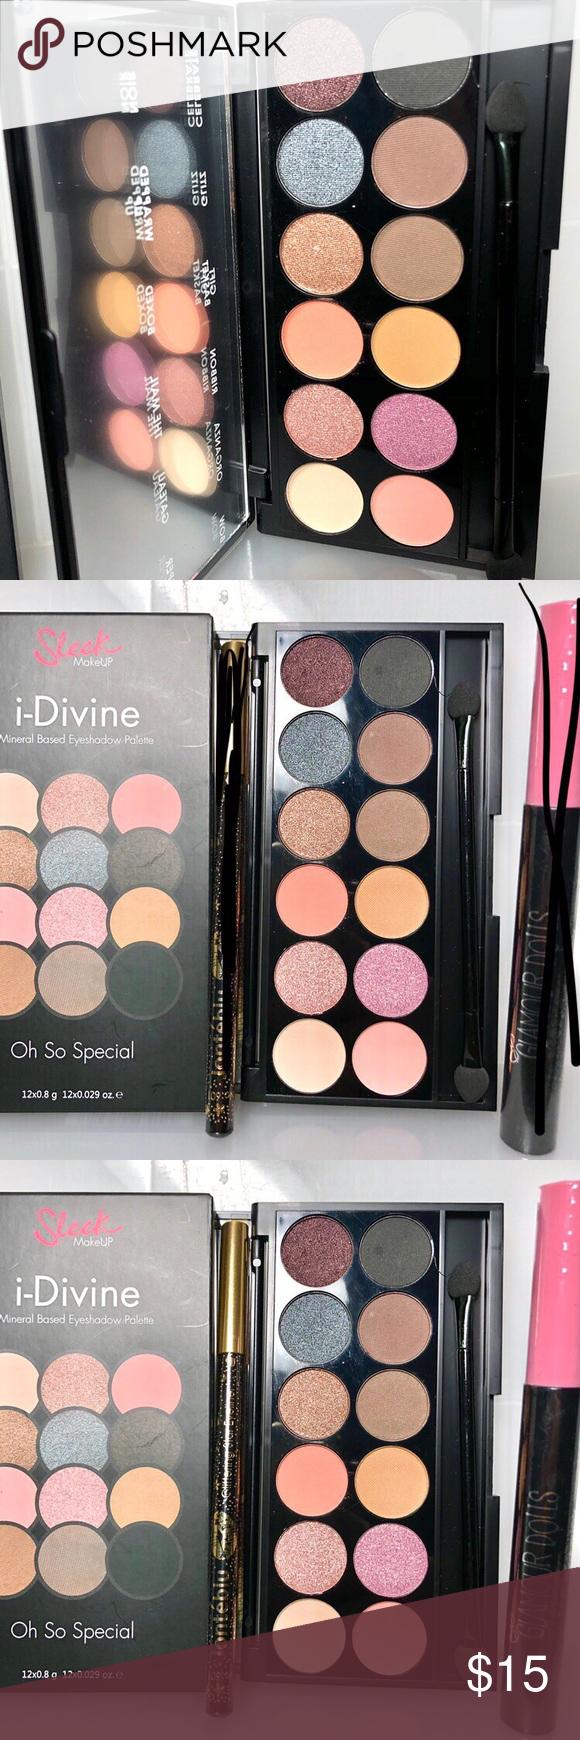 Sleek MakeUP iDivine Mine Eyeshadow Palette Sleek MakeUP I-Divine Mineral Based Eyeshadow Palette O